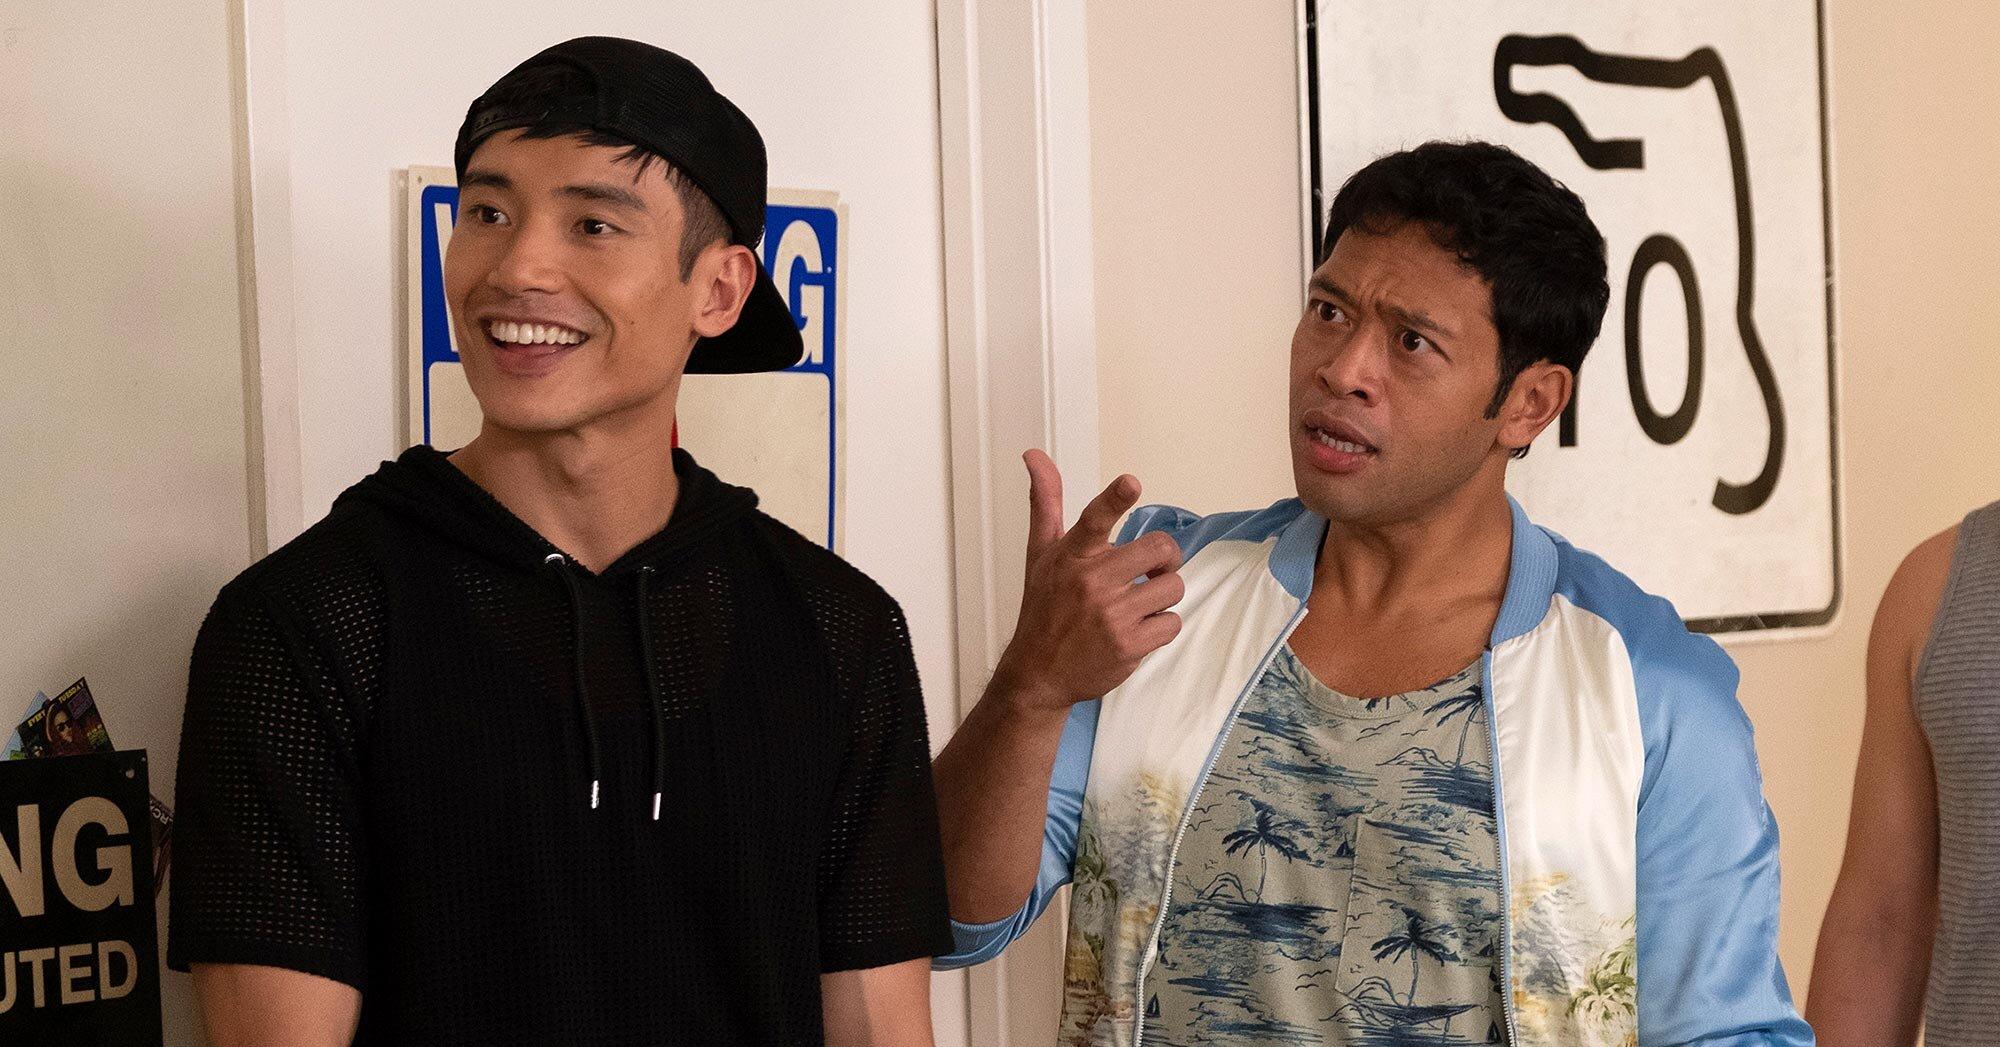 Eugene Cordero explains the origin of Pillboi and Jason's epic 'Good Place' handshake